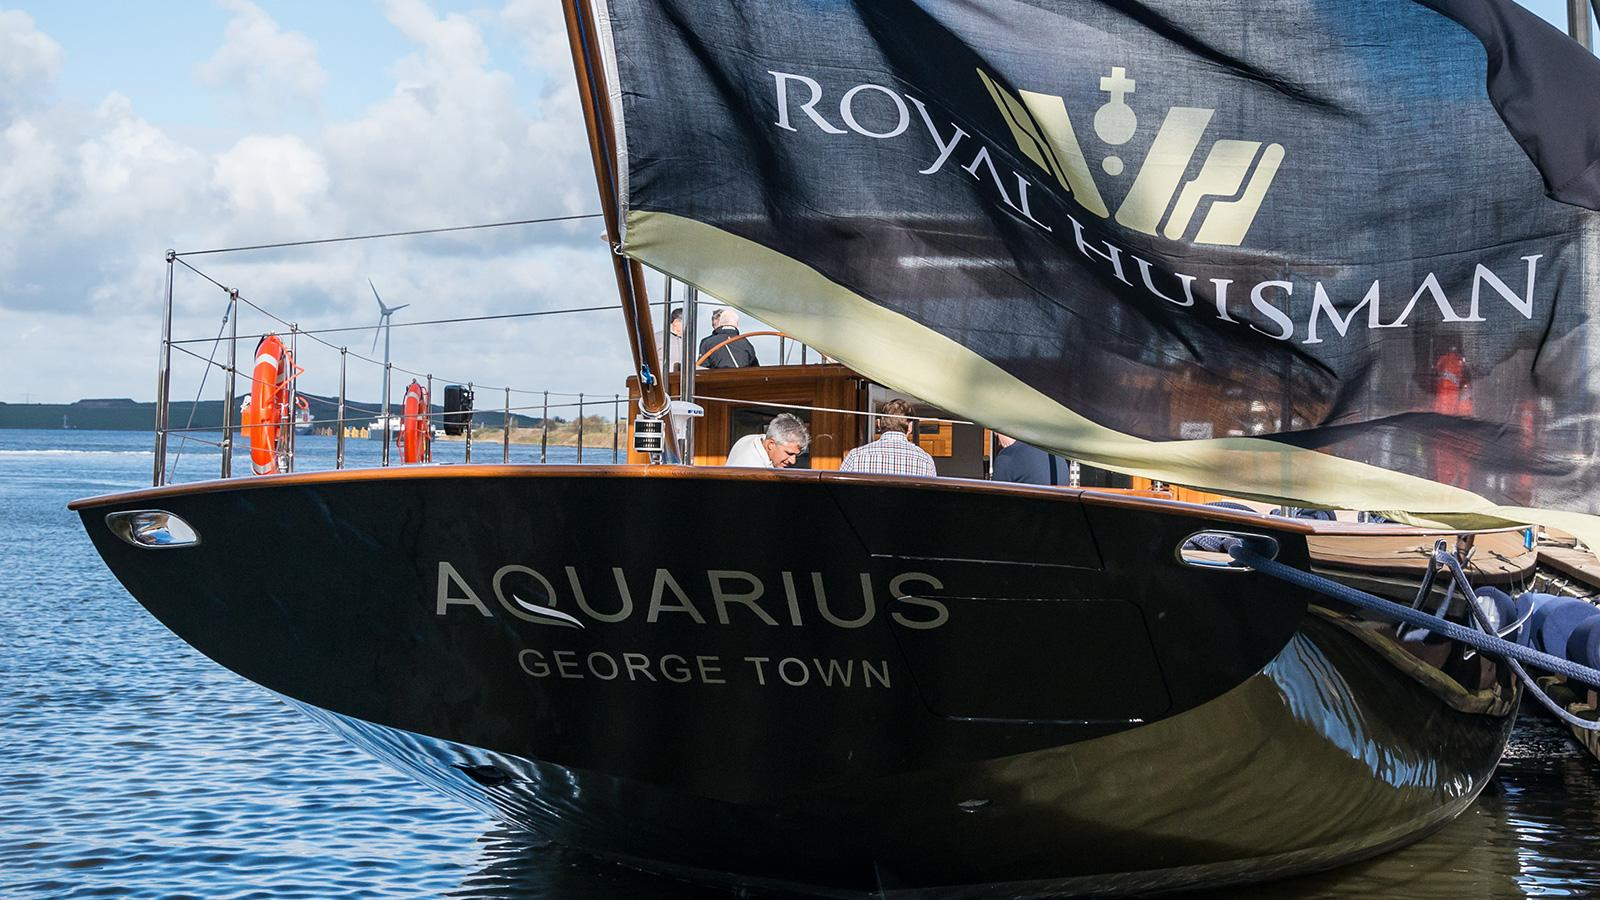 aquarius sailing yacht royal huisman 56m 2018 launch stern